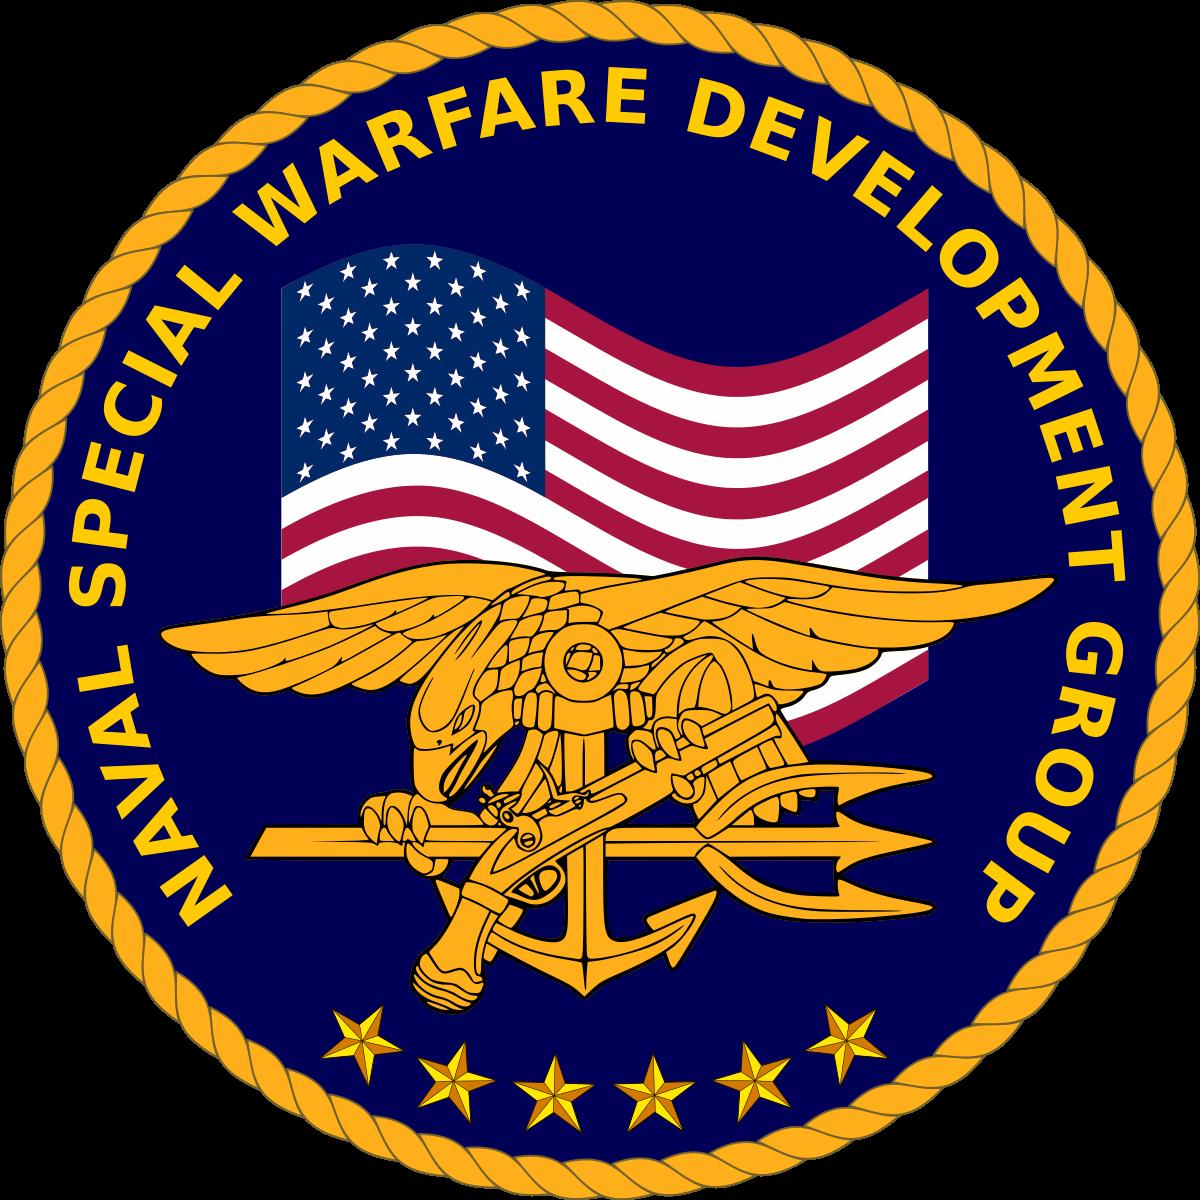 1200px-Logo_Naval_Special_Warfare_Development_Group.svg.png